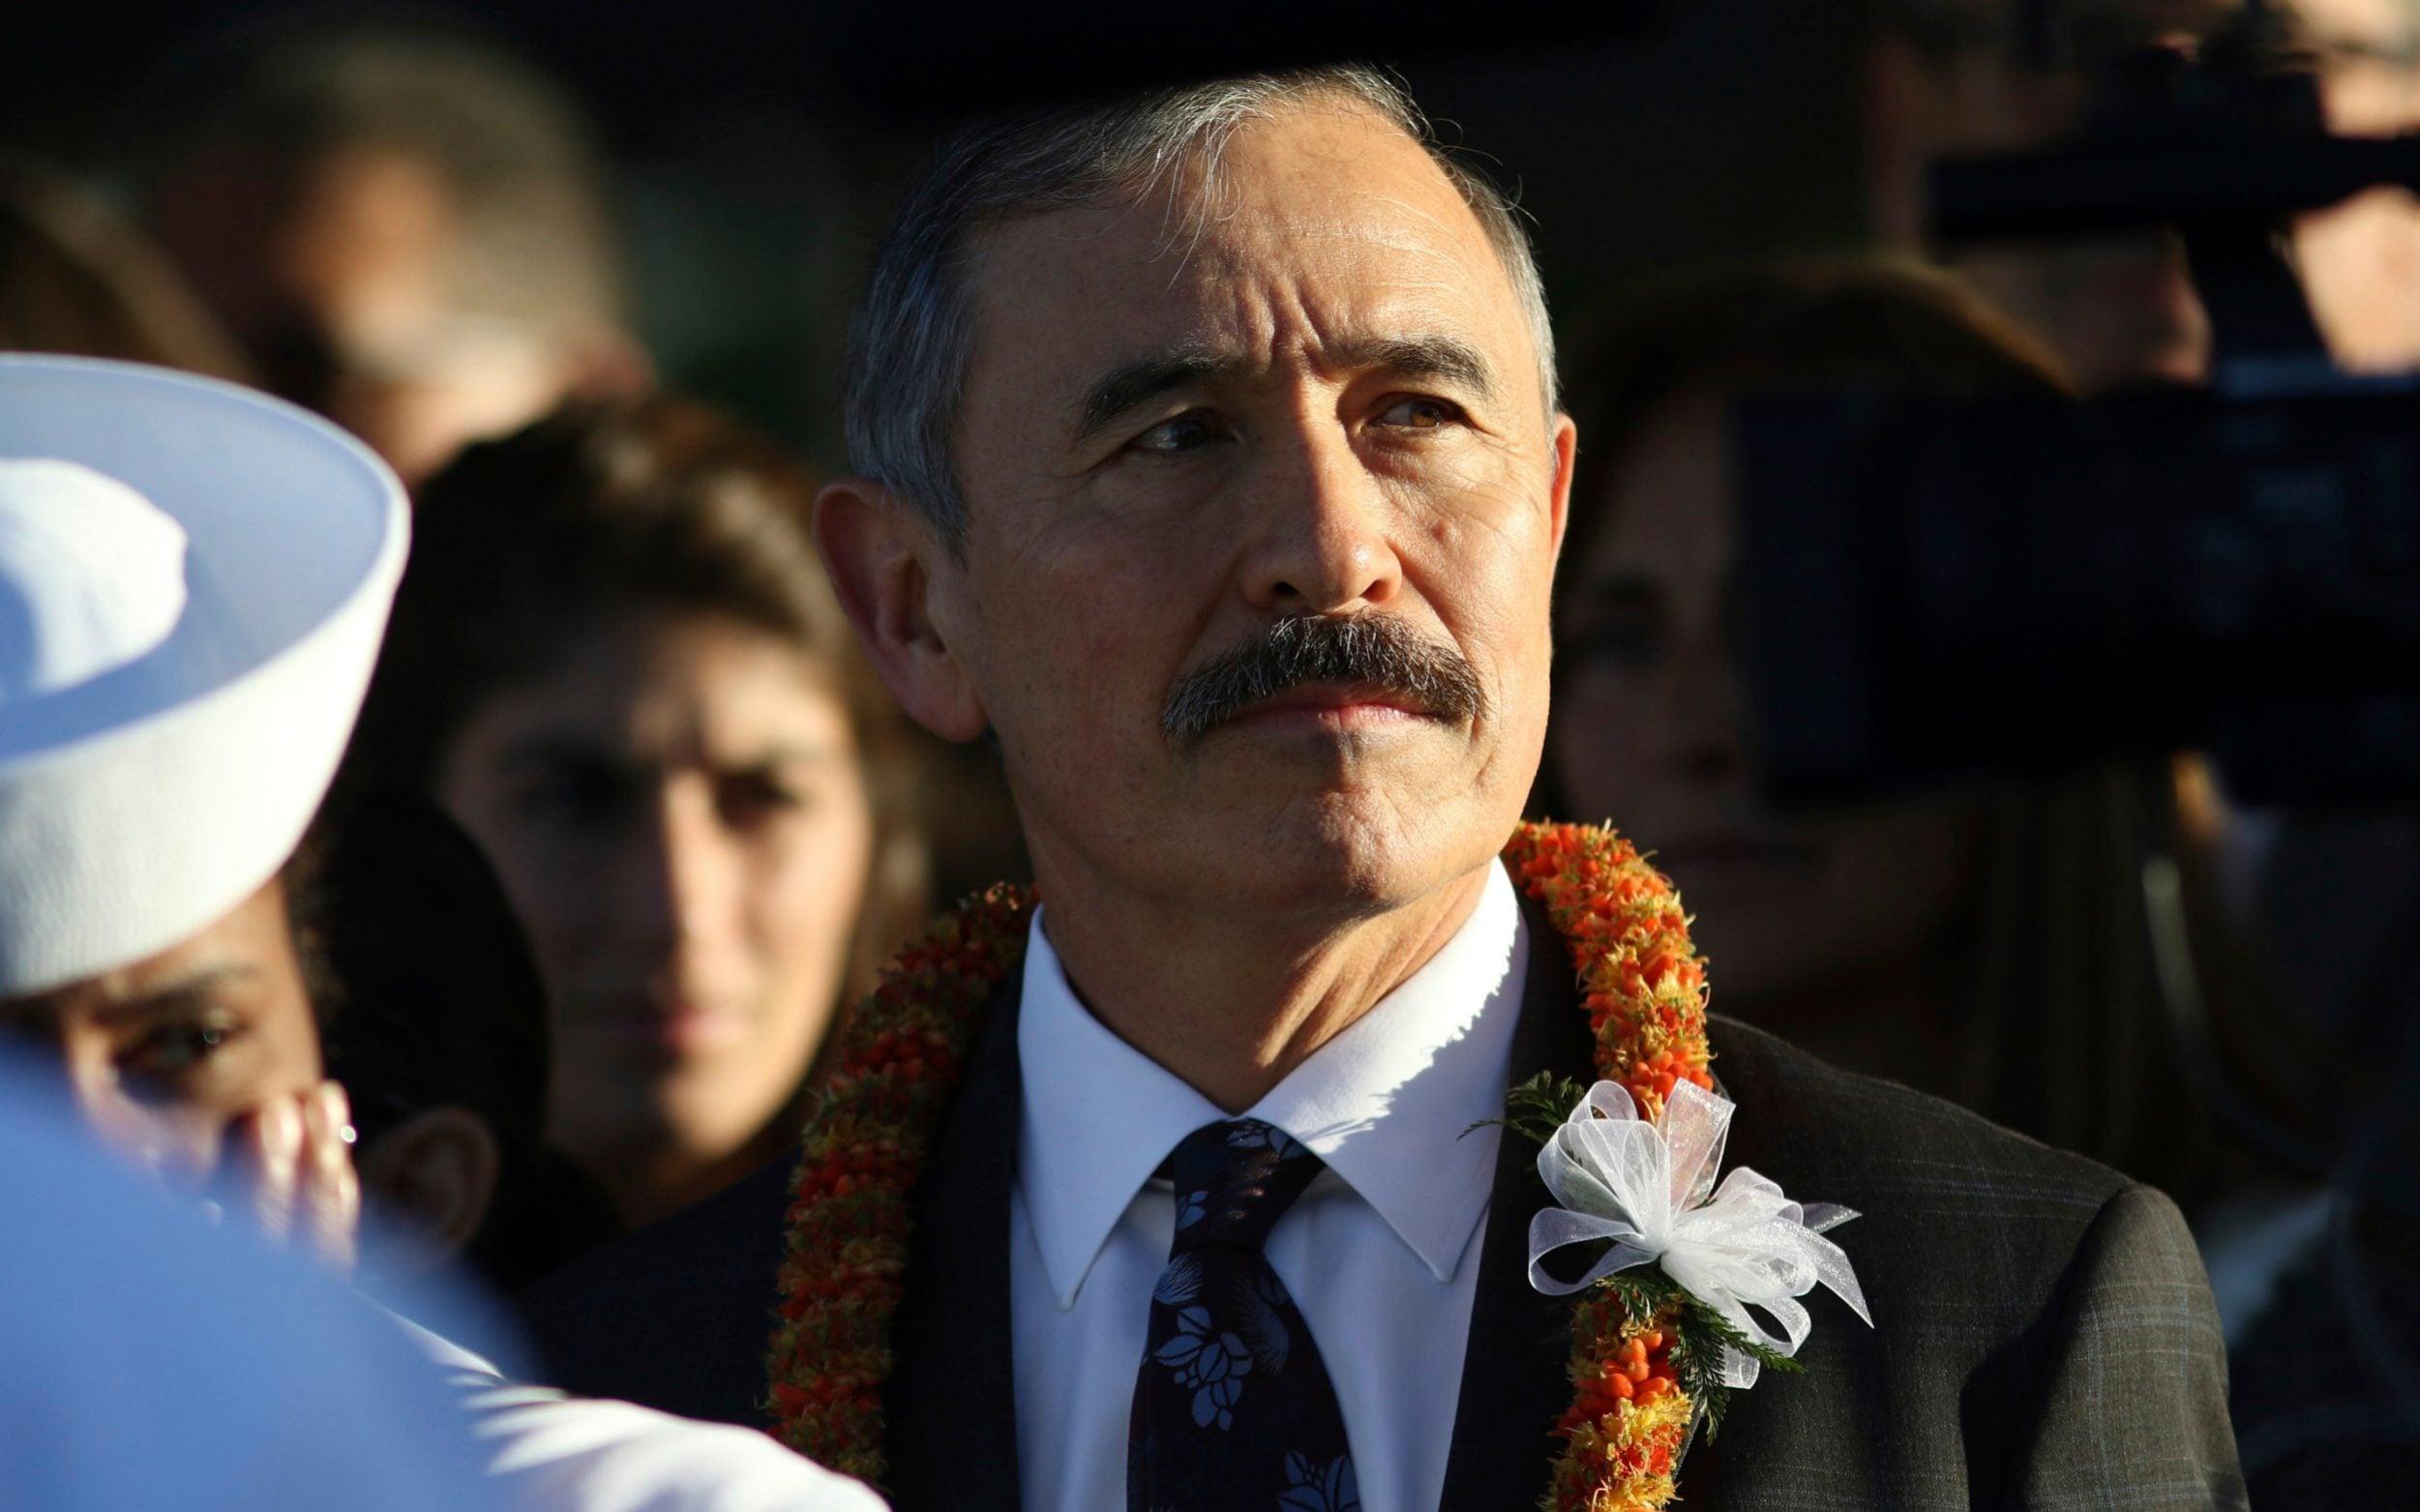 US ambassador defends moustache as South Koreans bristle at disrespectful facial hair